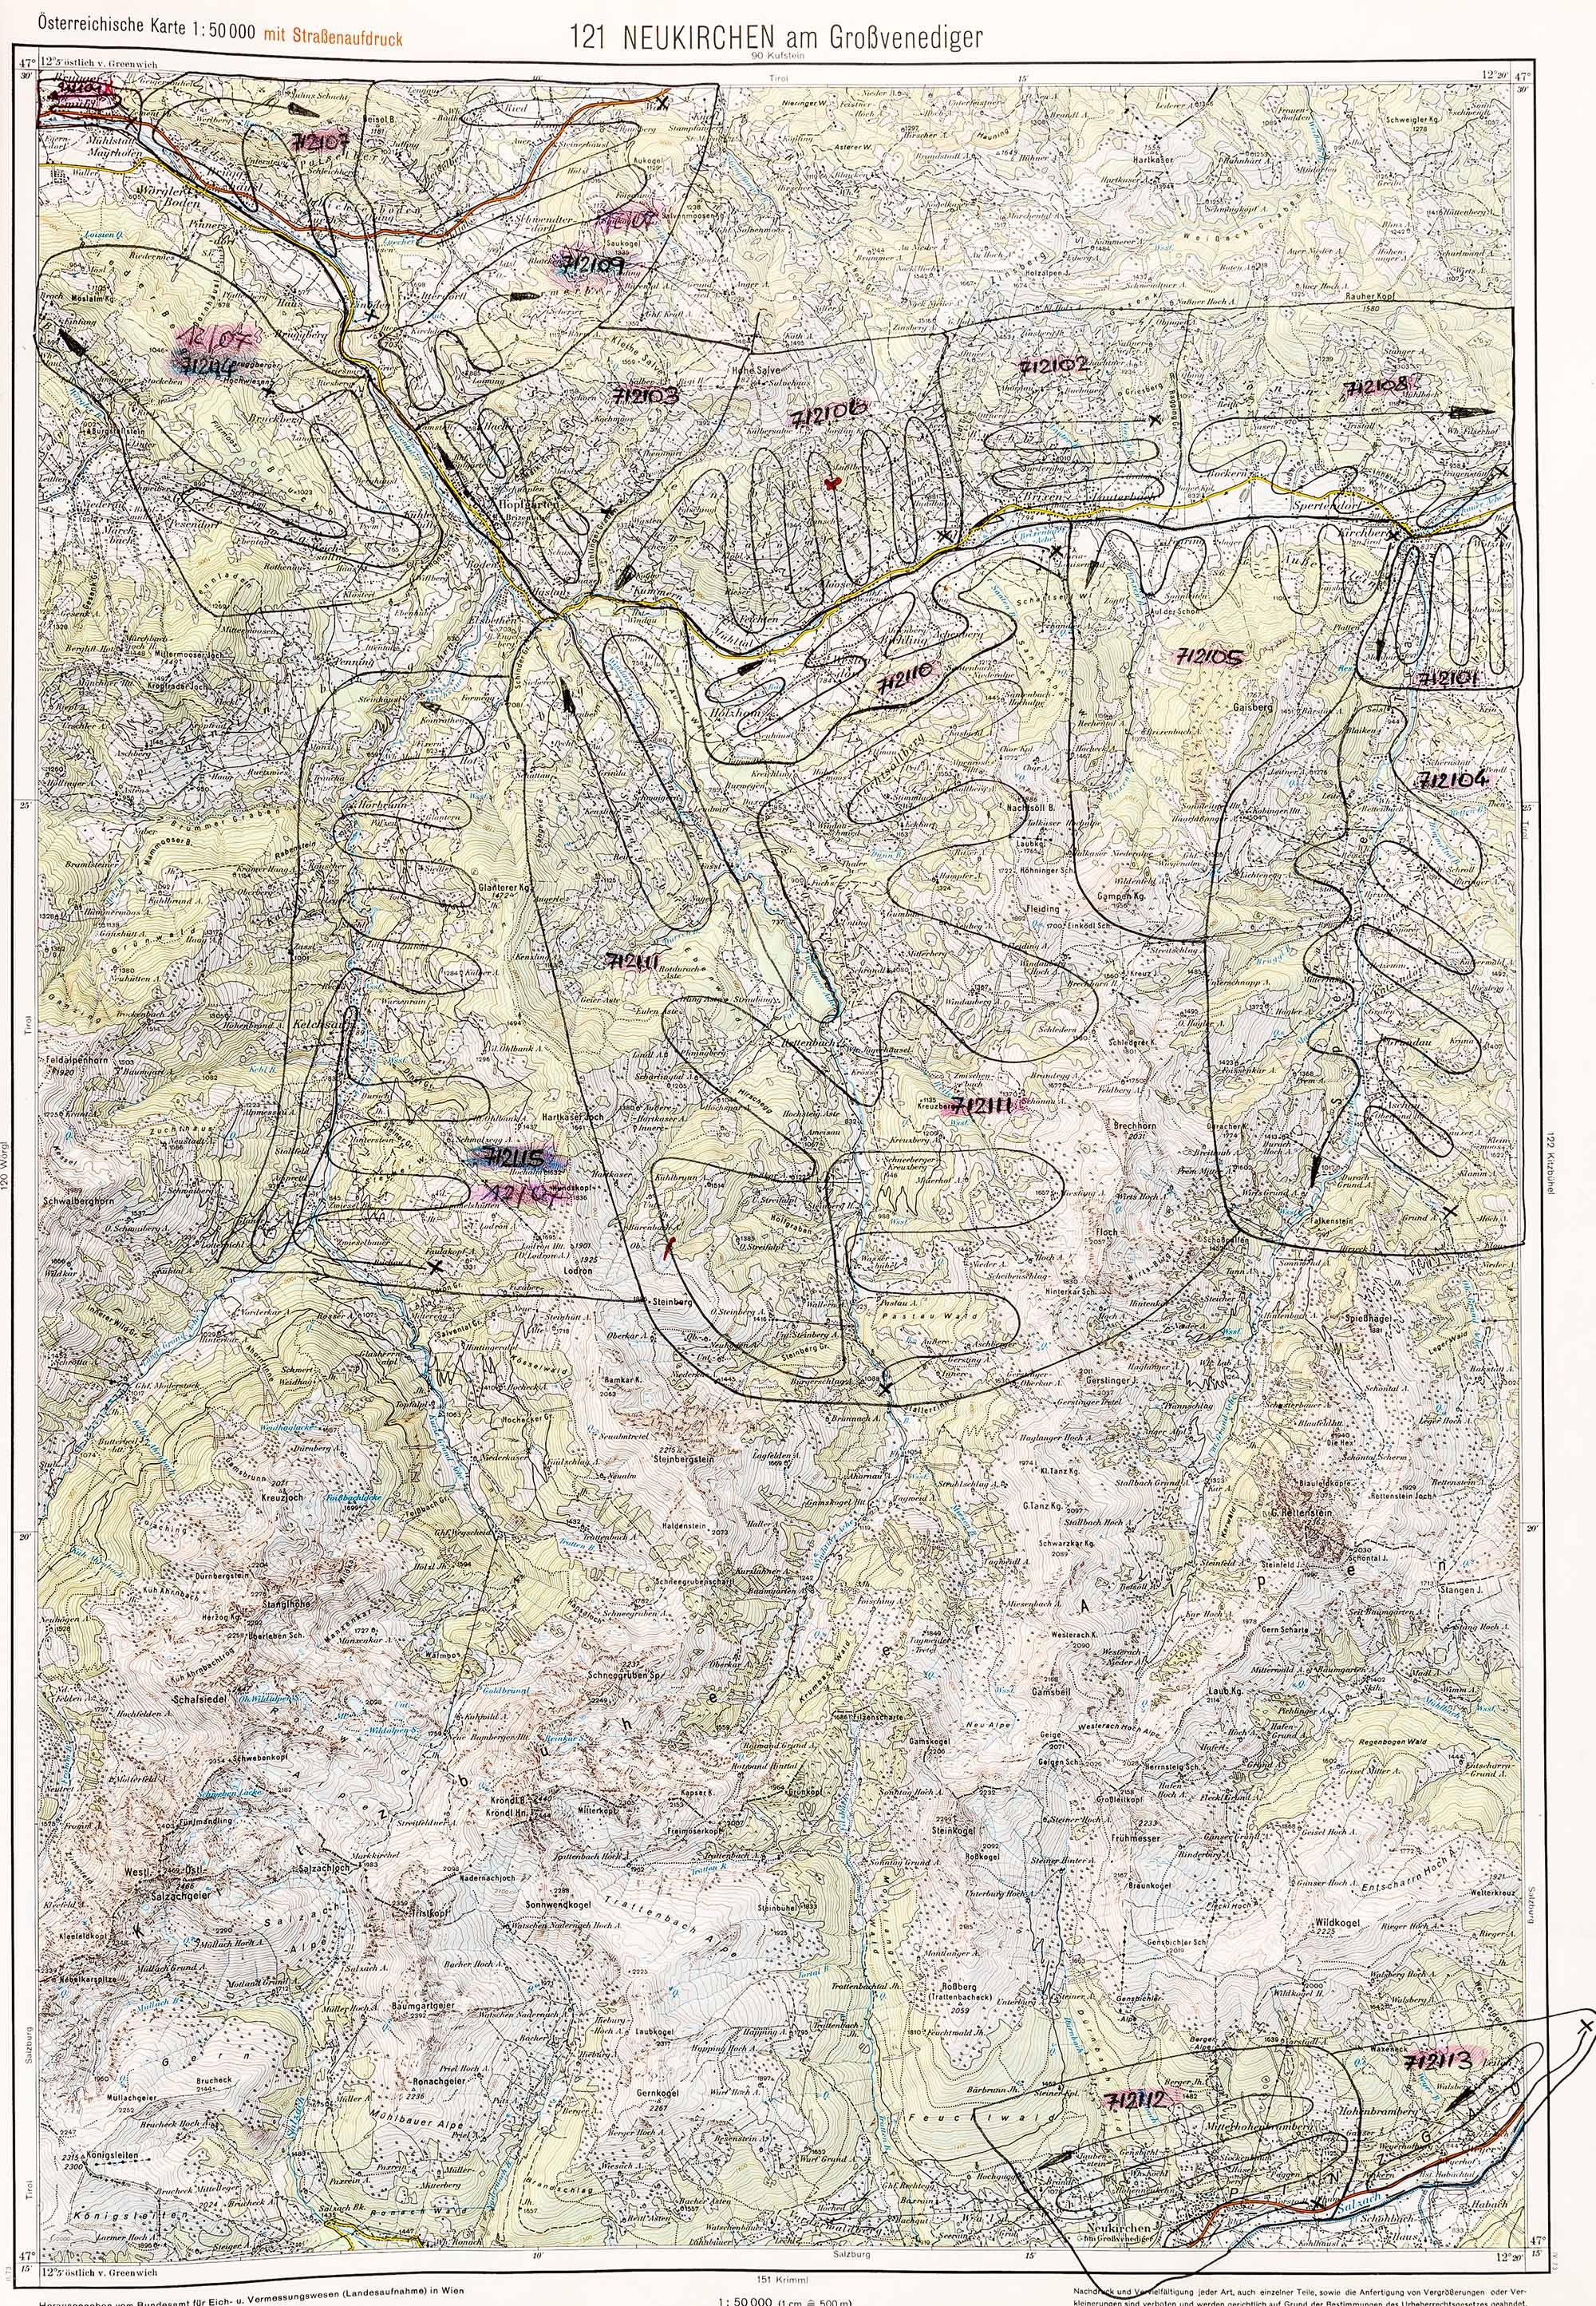 1975-1979 Karte 121